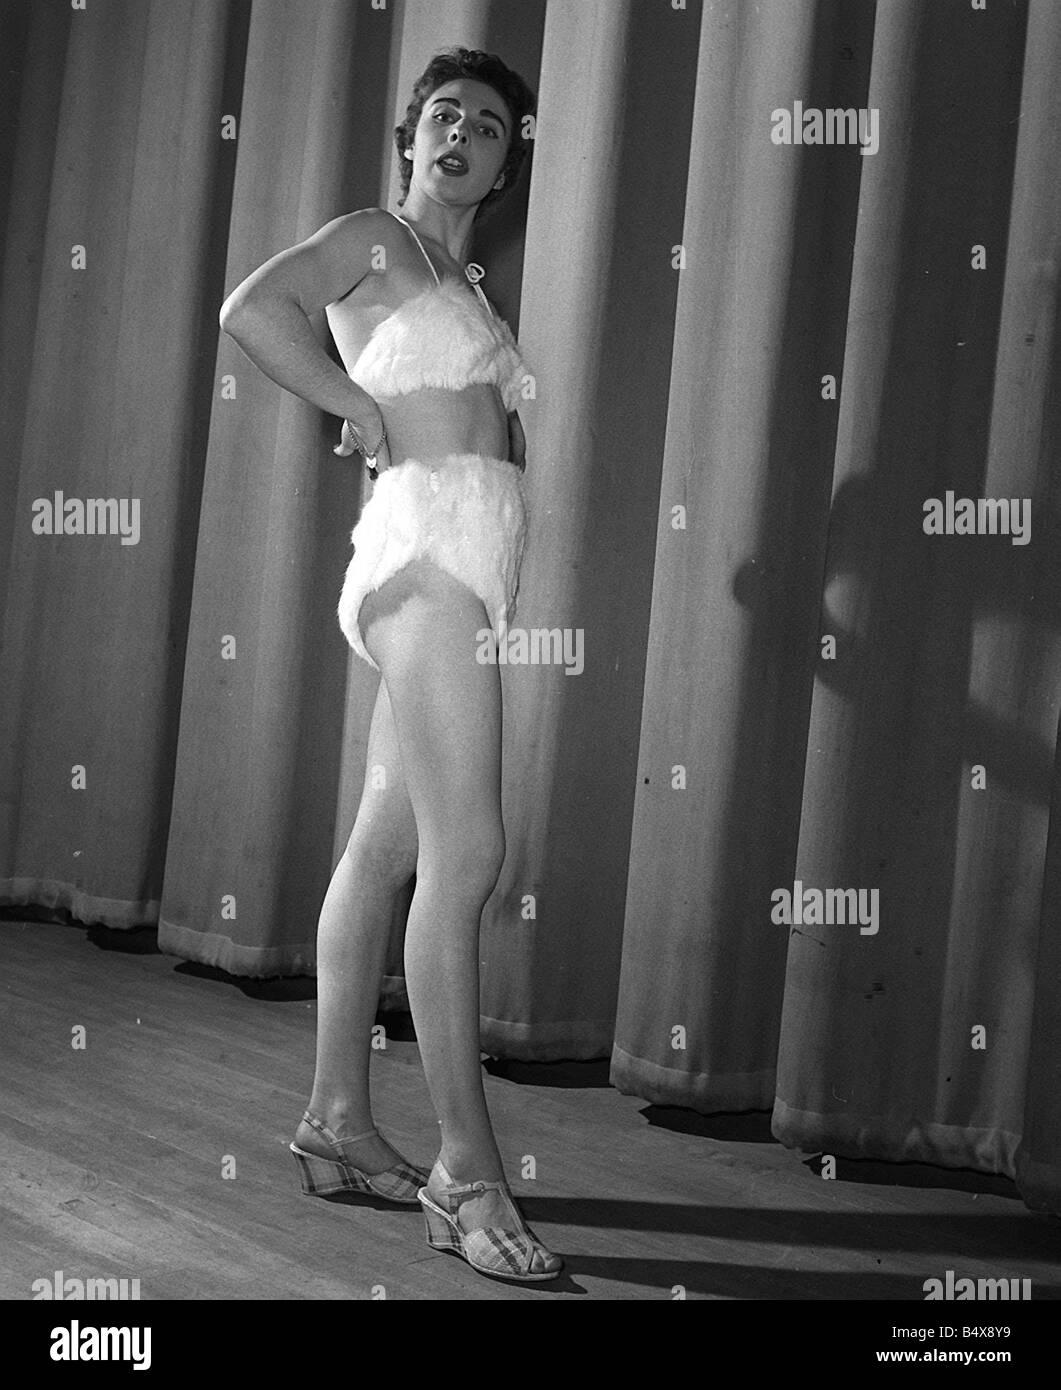 Mink fur bikini 1954 worn by Jackie Lee at fashion show Stoke Newington town hall The mink fur bikini the height - Stock Image